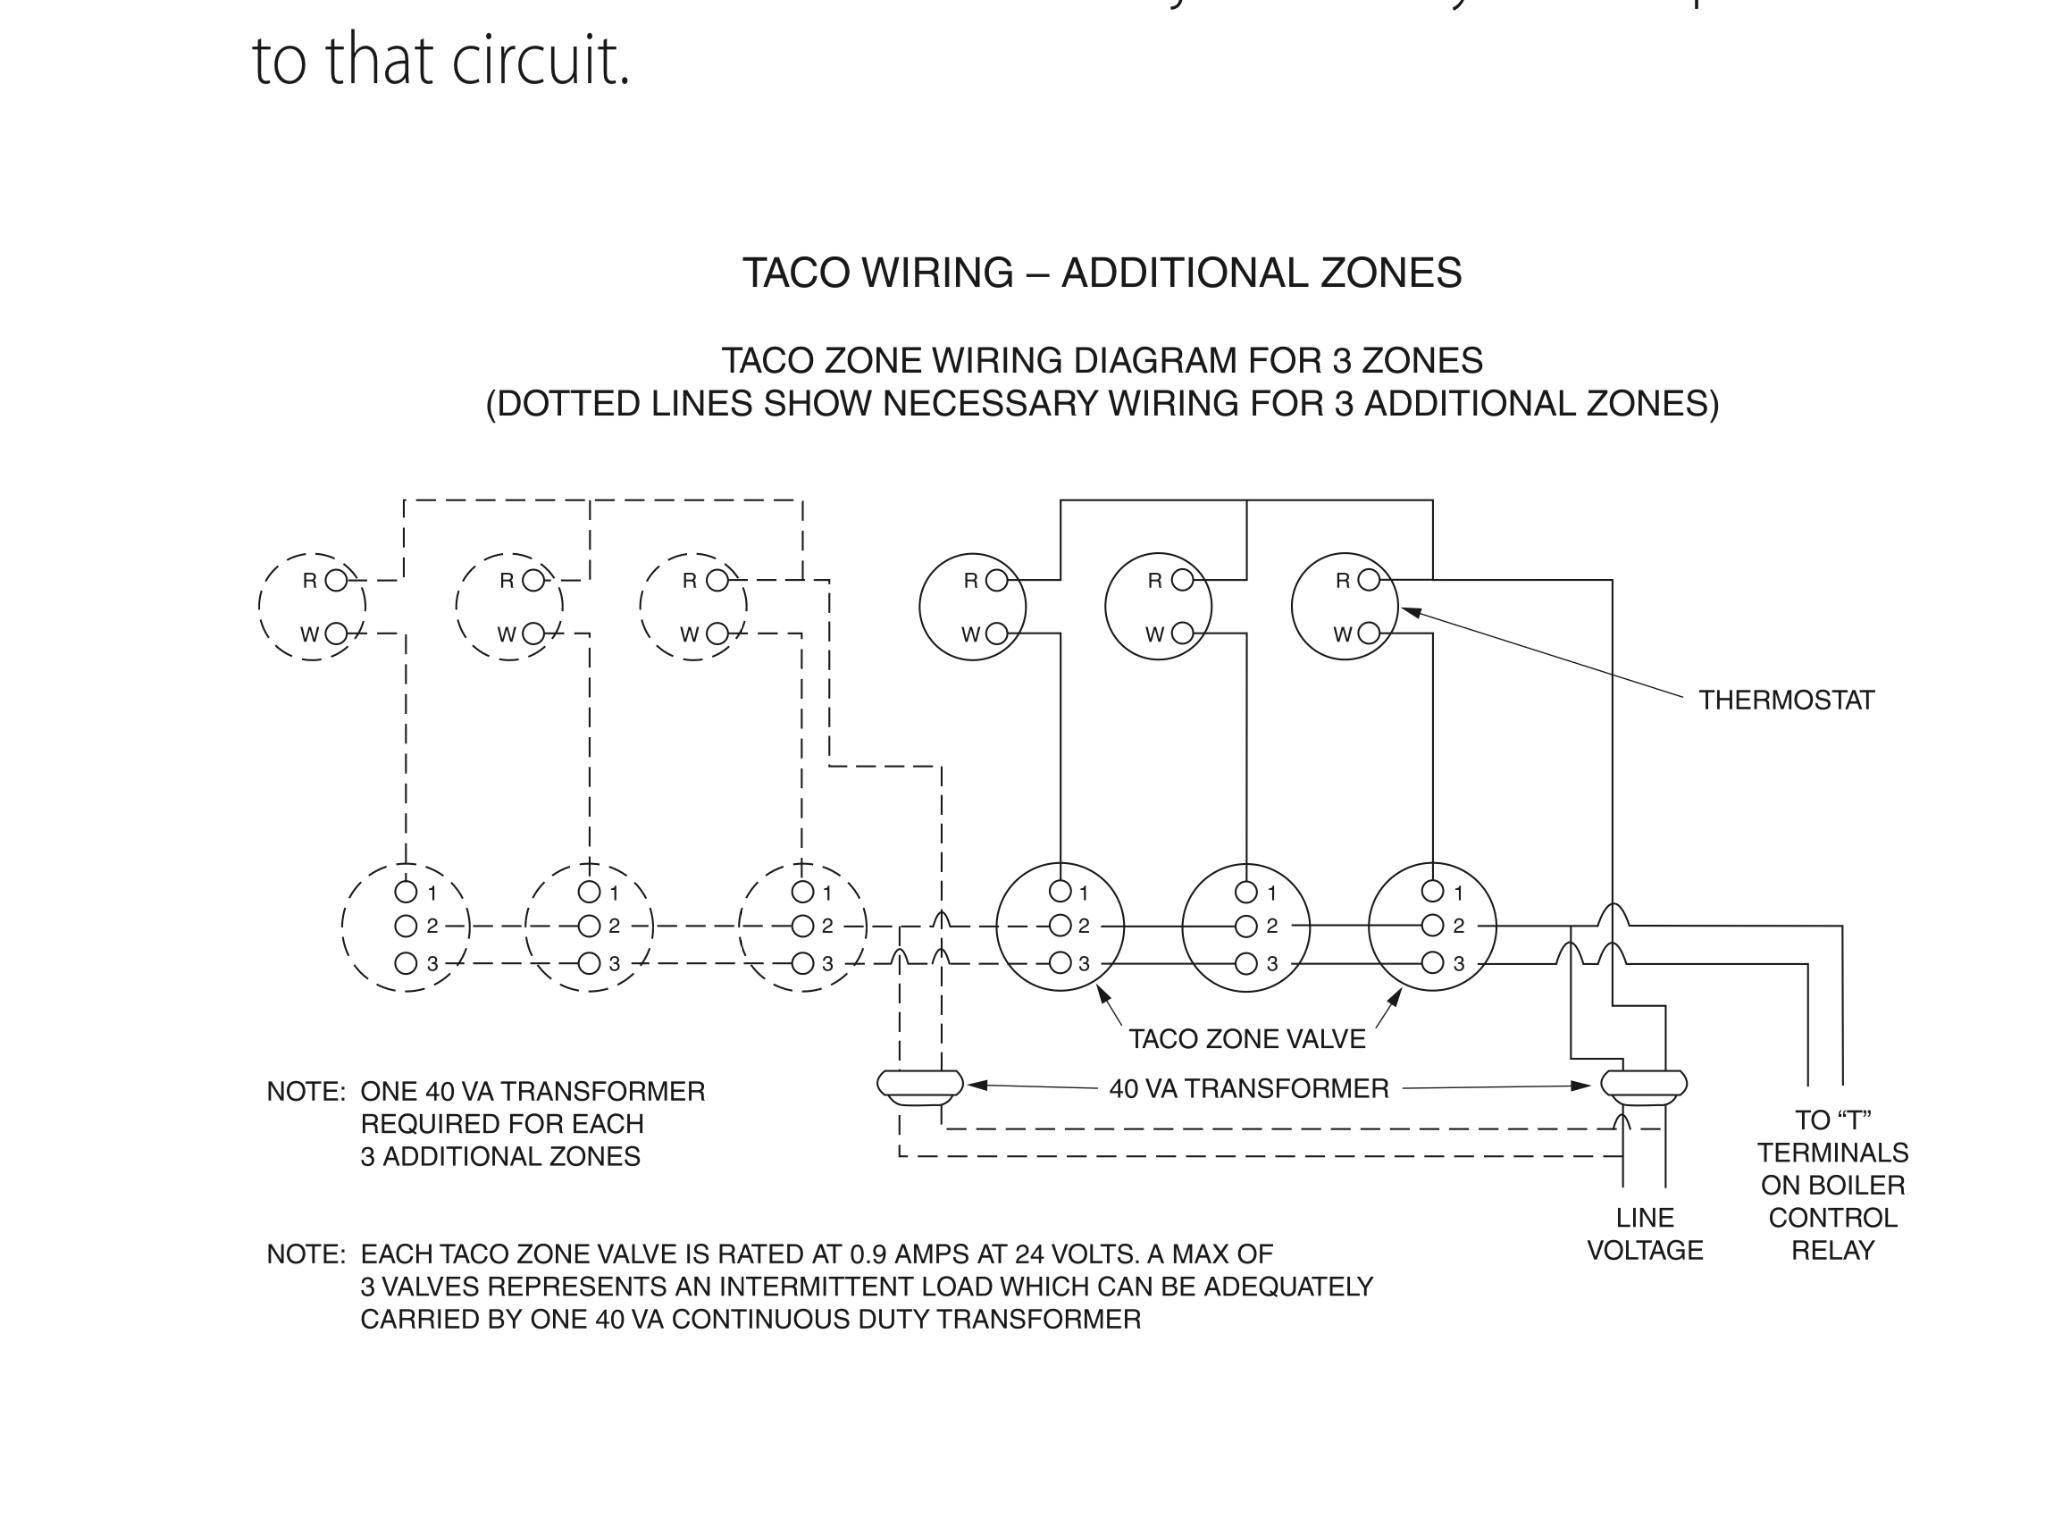 Taco Zone Valve Wiring Diagram 573 | Wiring Diagram - Taco Zone Valve Wiring Diagram